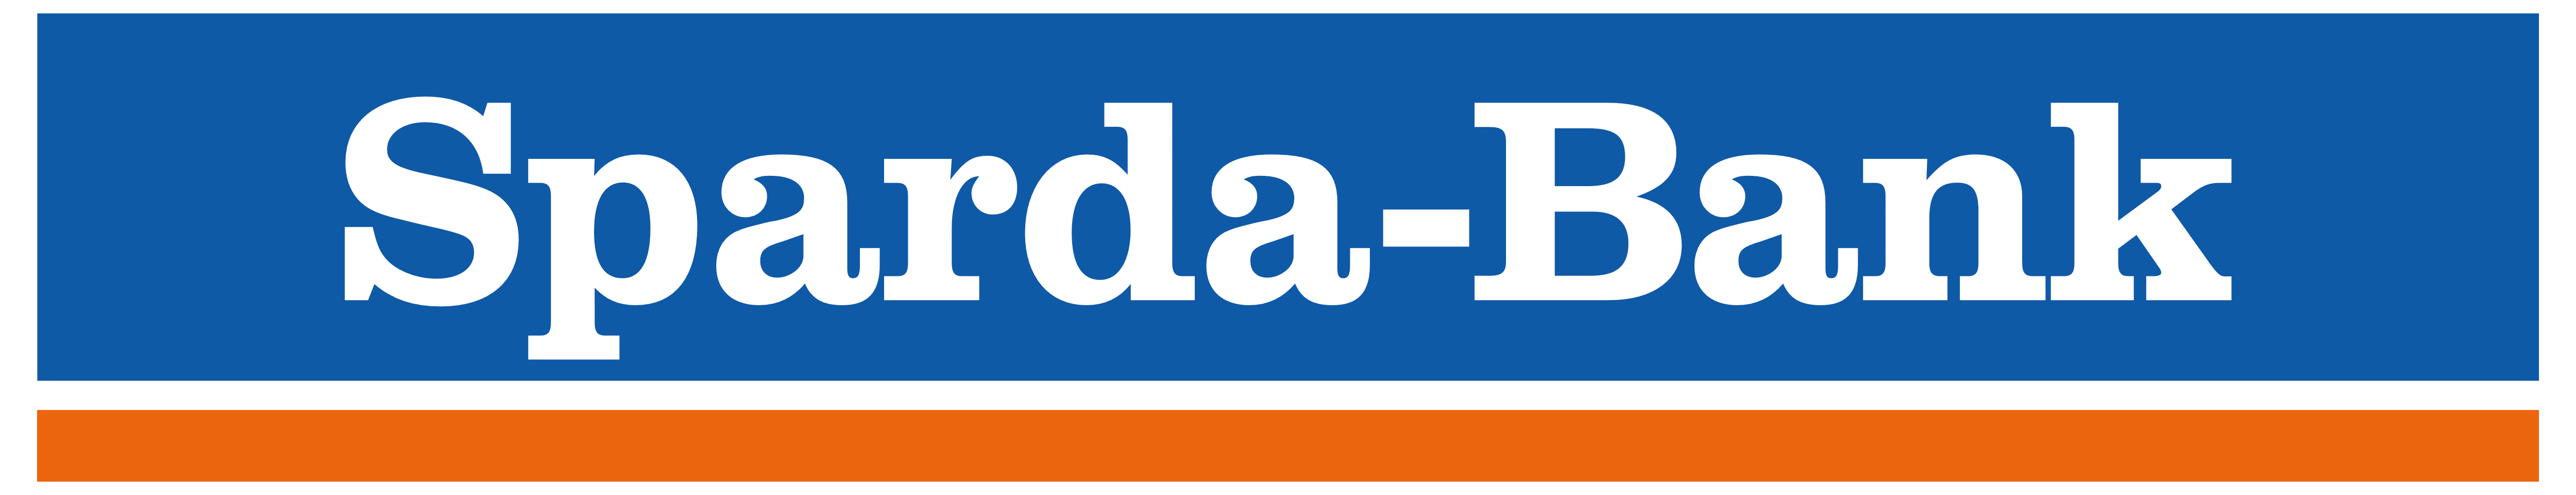 Sparda Bank Logos Download